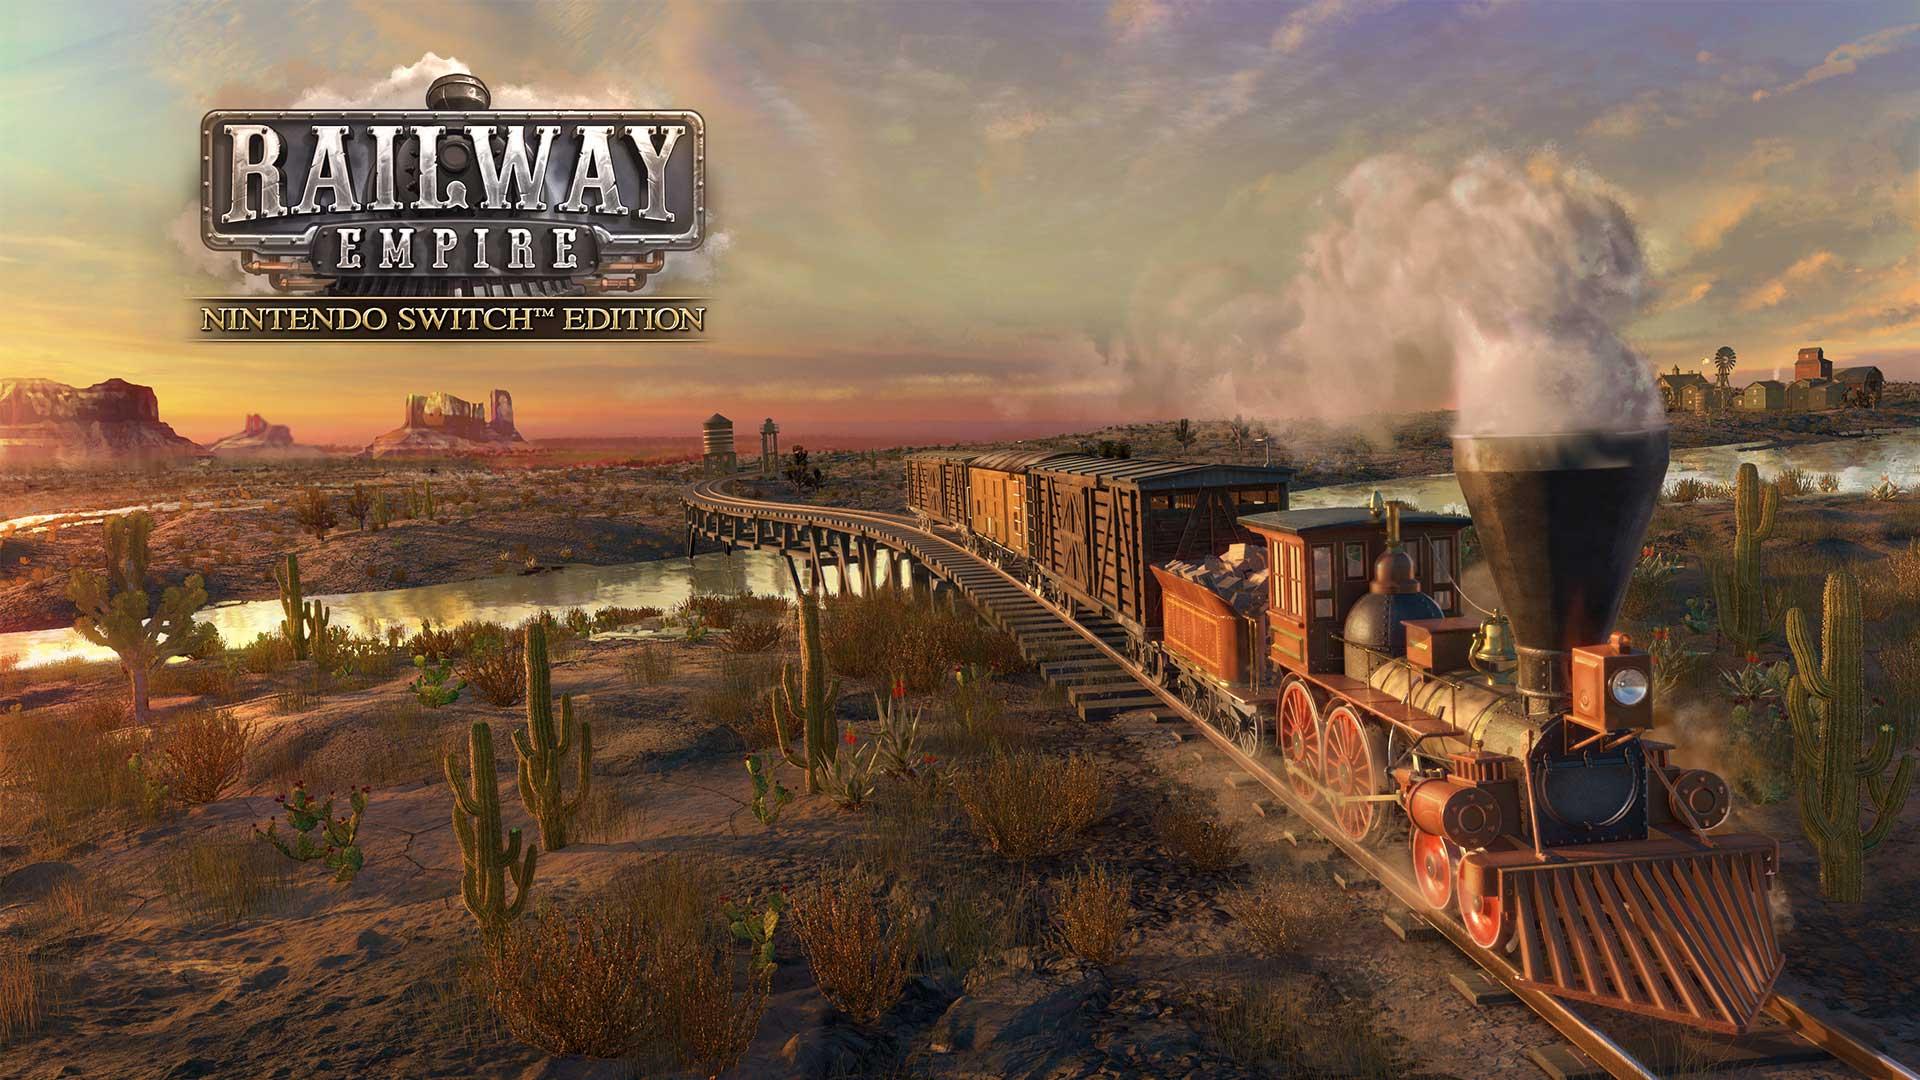 railway empire nintendo switch edition switch hero babt